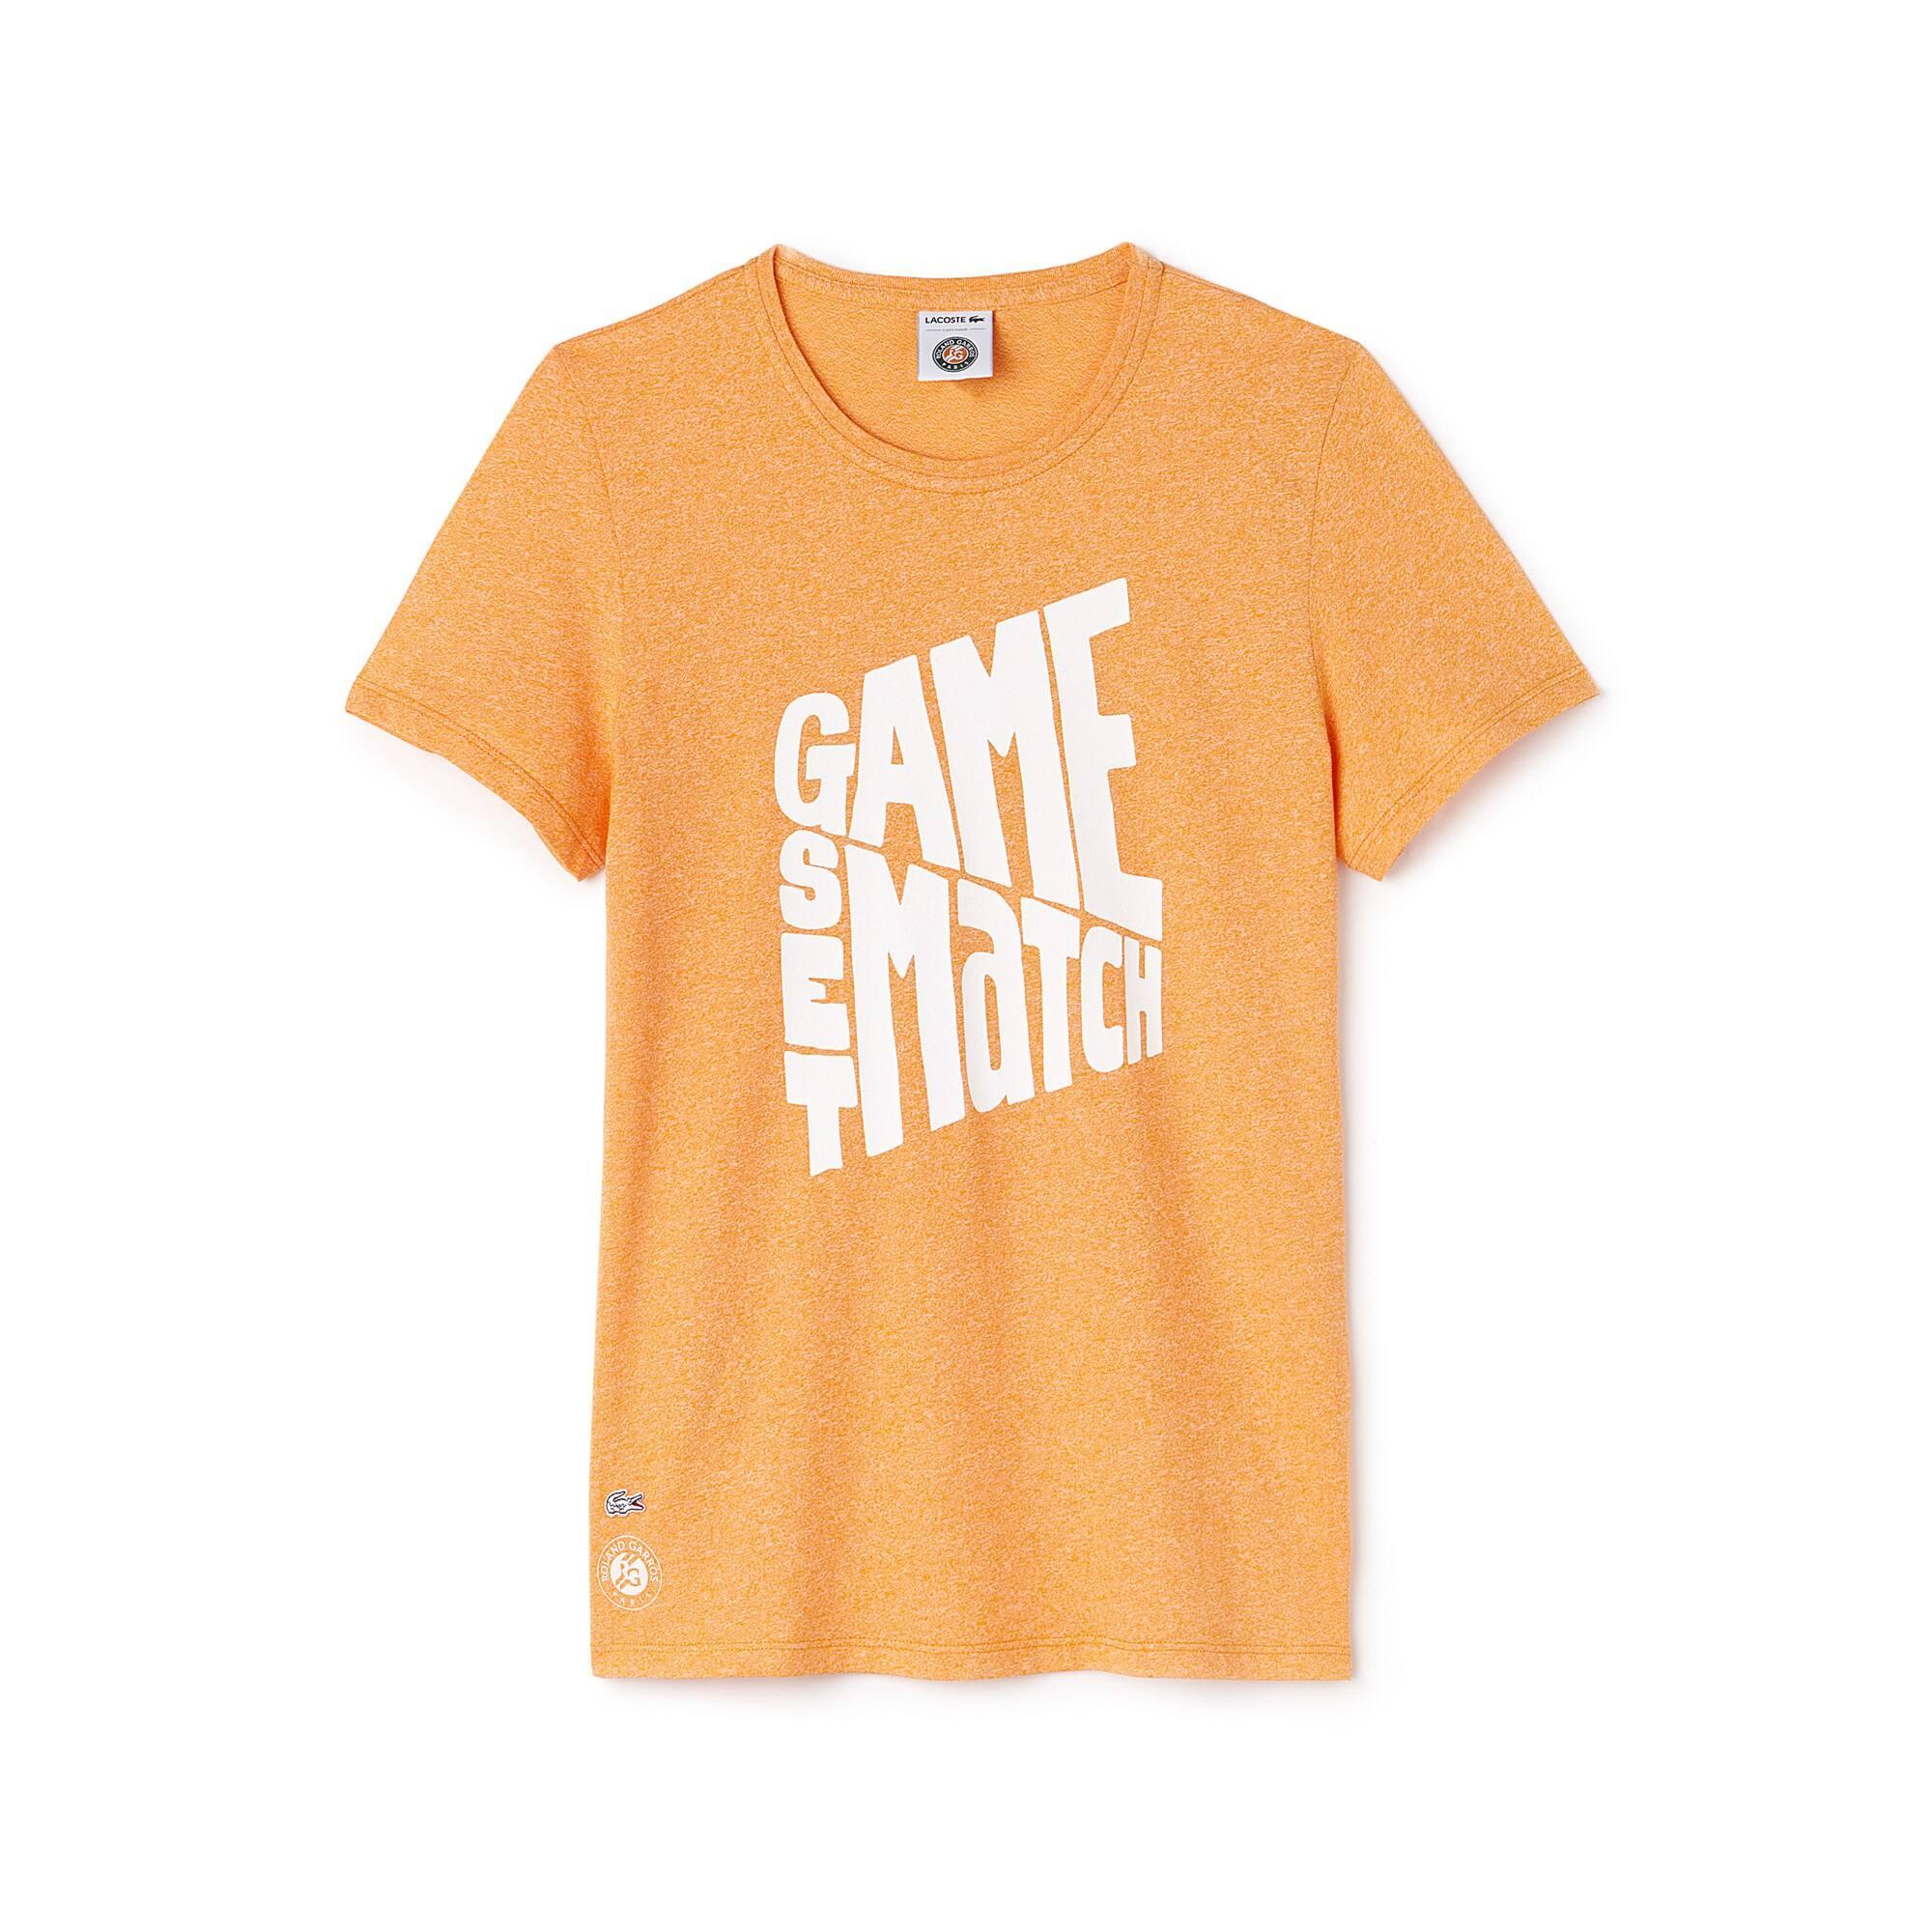 Women's Lacoste SPORT Roland Garros Edition Design Jersey T-shirt